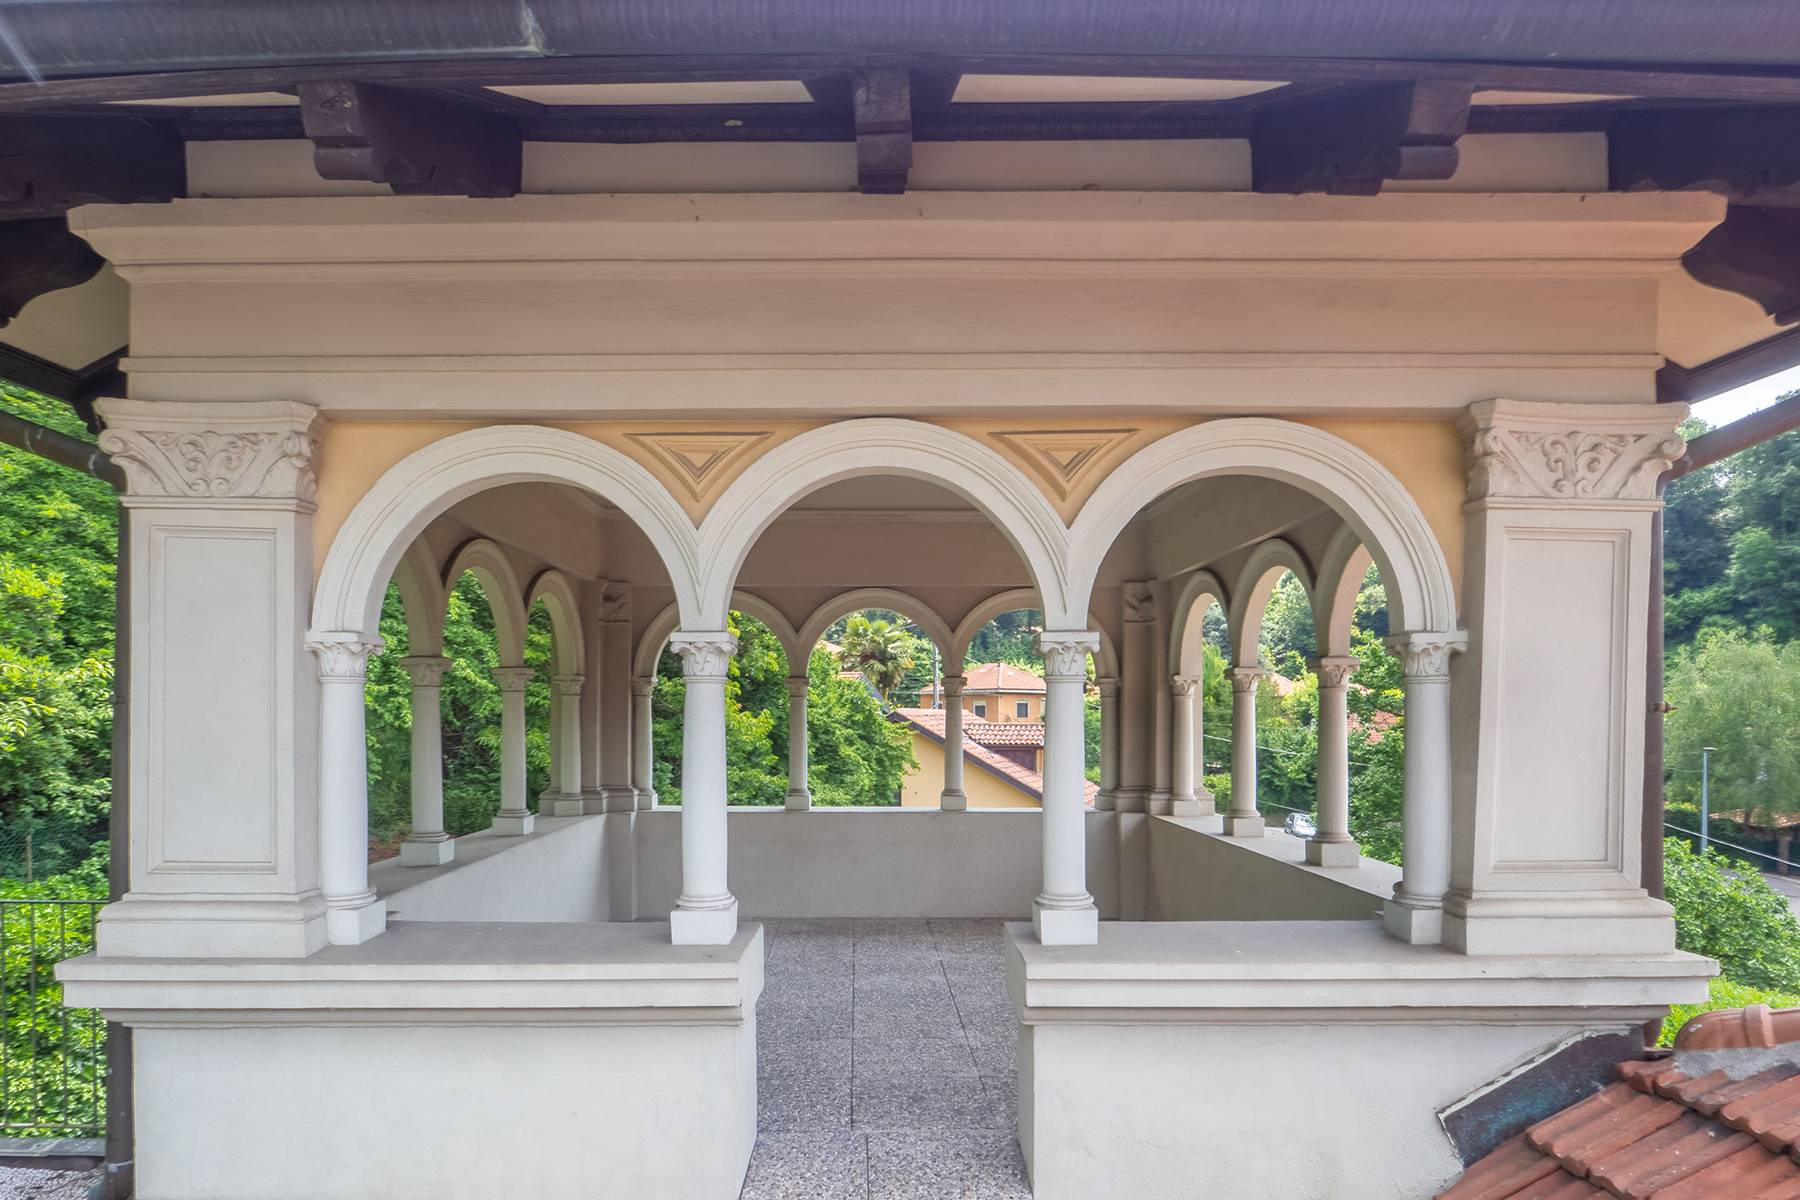 Casa indipendente in Vendita a Torino: 5 locali, 657 mq - Foto 13